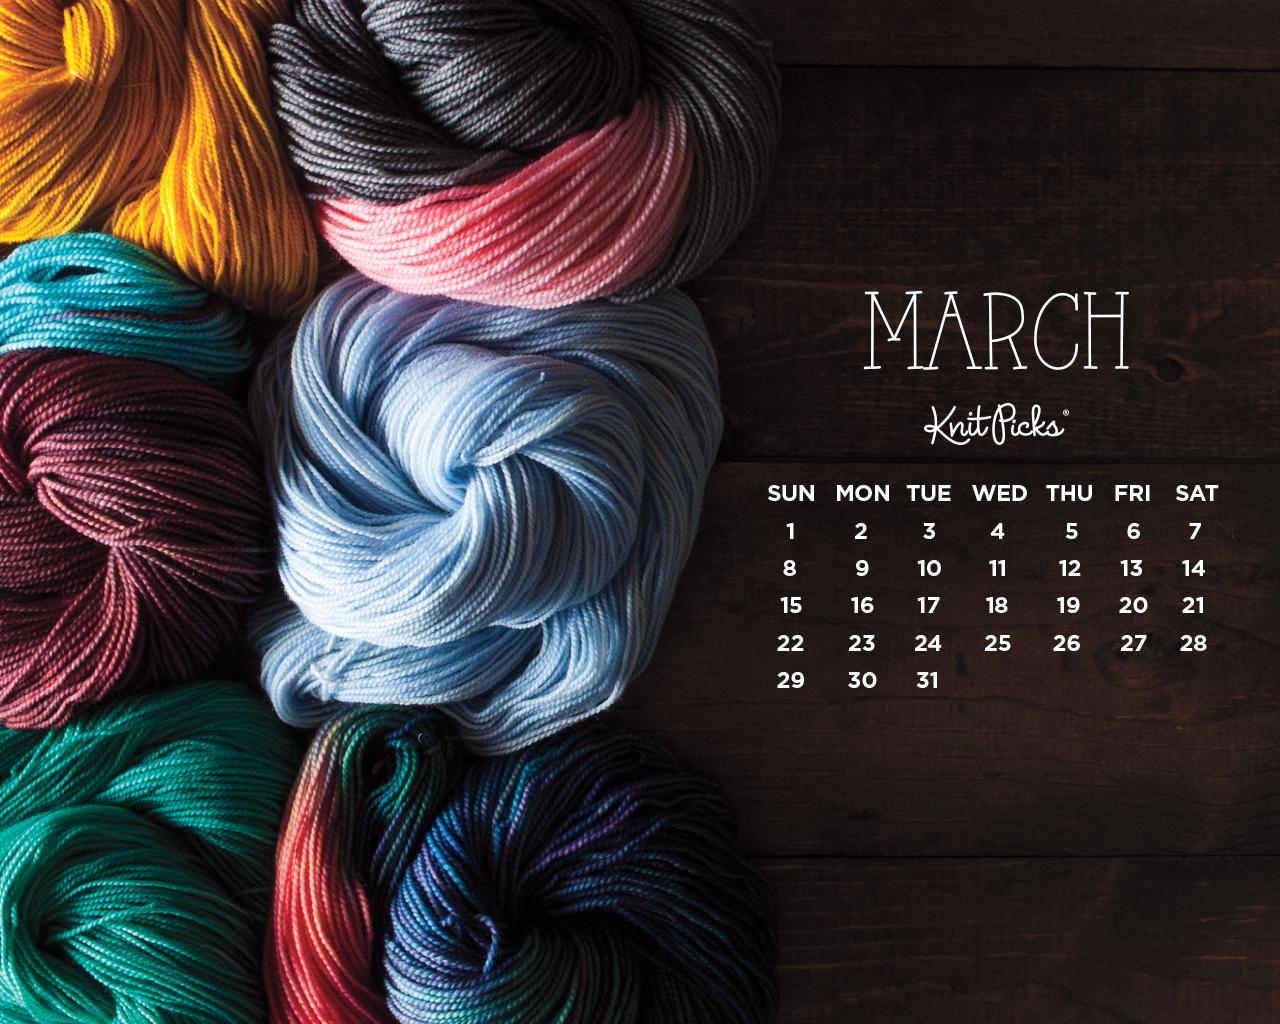 March 2015 wallpaper calendar knitpicks staff knitting blog - March desktop wallpaper ...